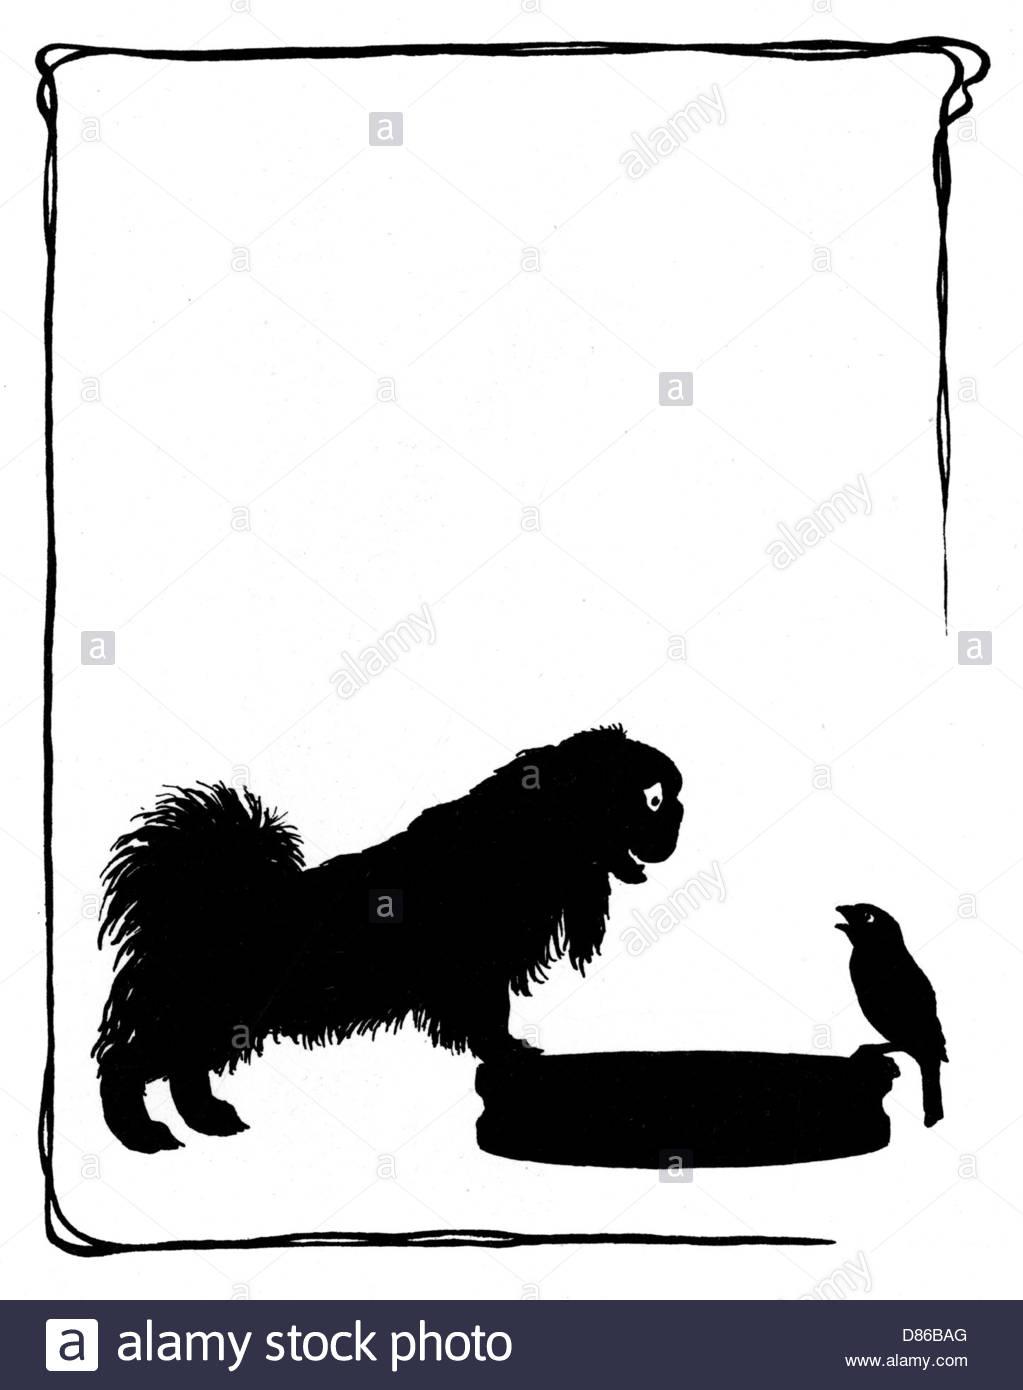 1023x1390 Koko The Pekinese Dog With Jack Sparrow Stock Photo 56688984